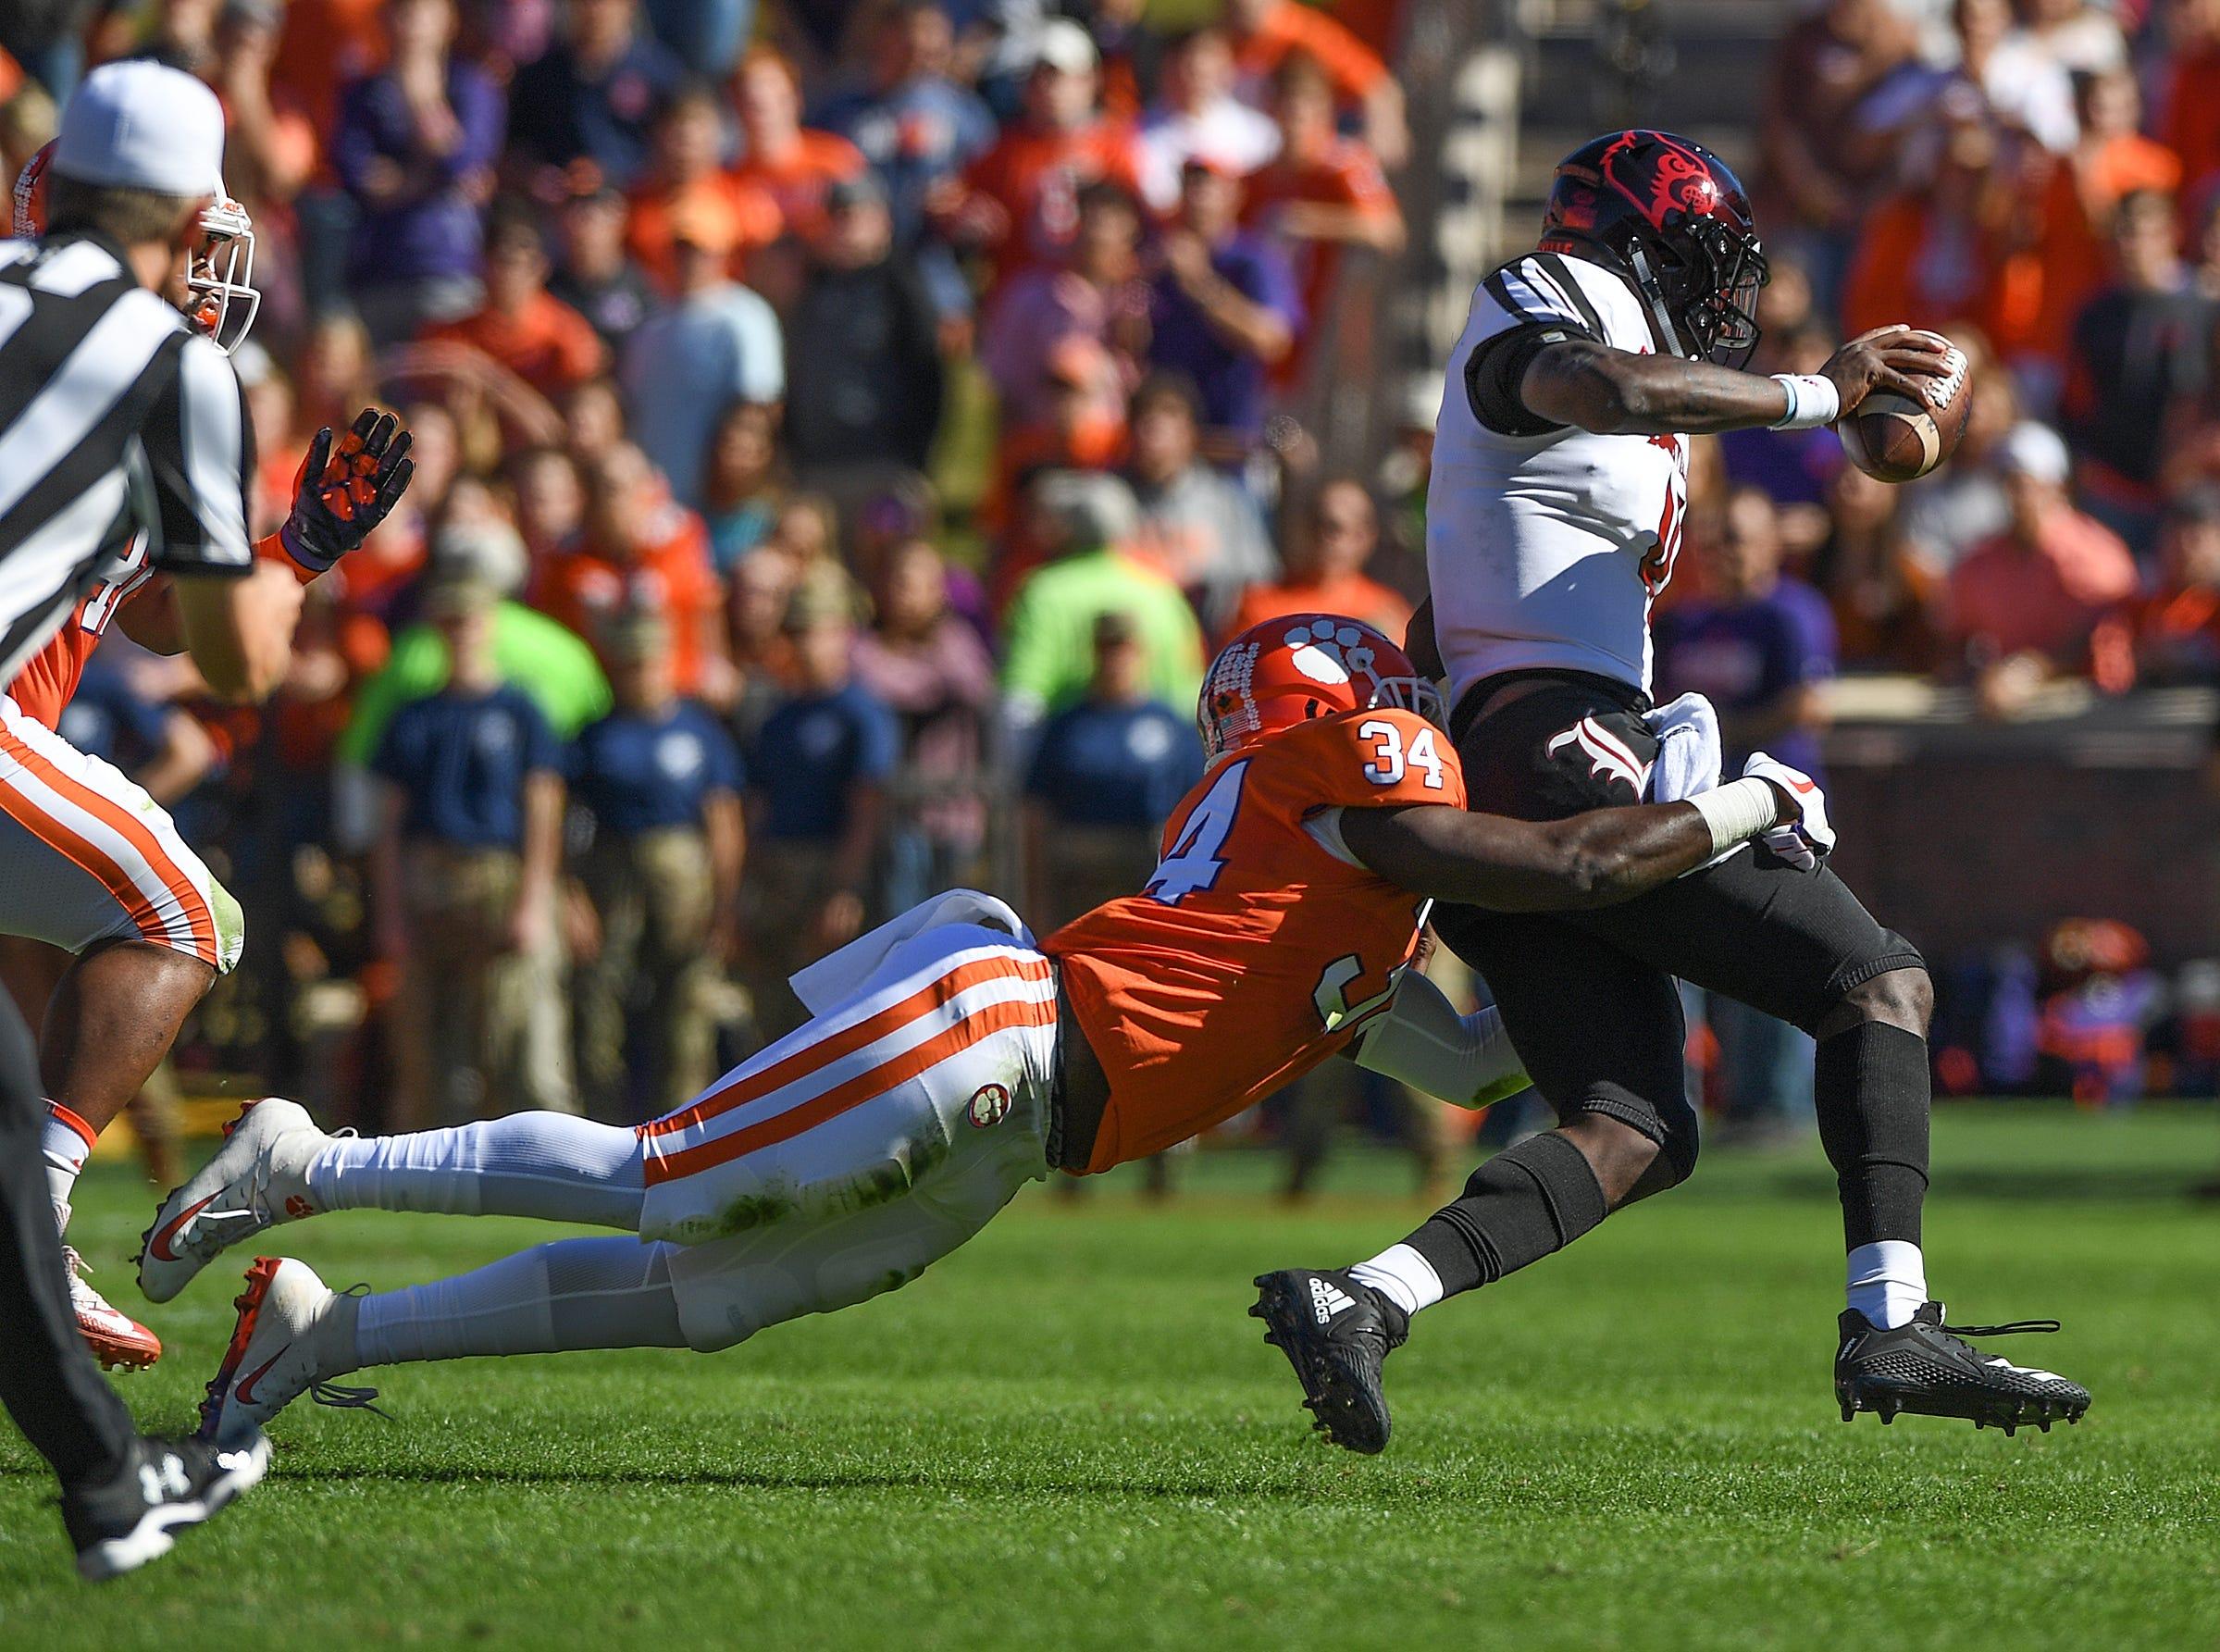 Clemson linebacker Kendall Joseph (34) brings down Louisville quarterback Jawon Pass (4) during the 1st quarter Saturday, November 3, 2018 at Clemson's Memorial Stadium.